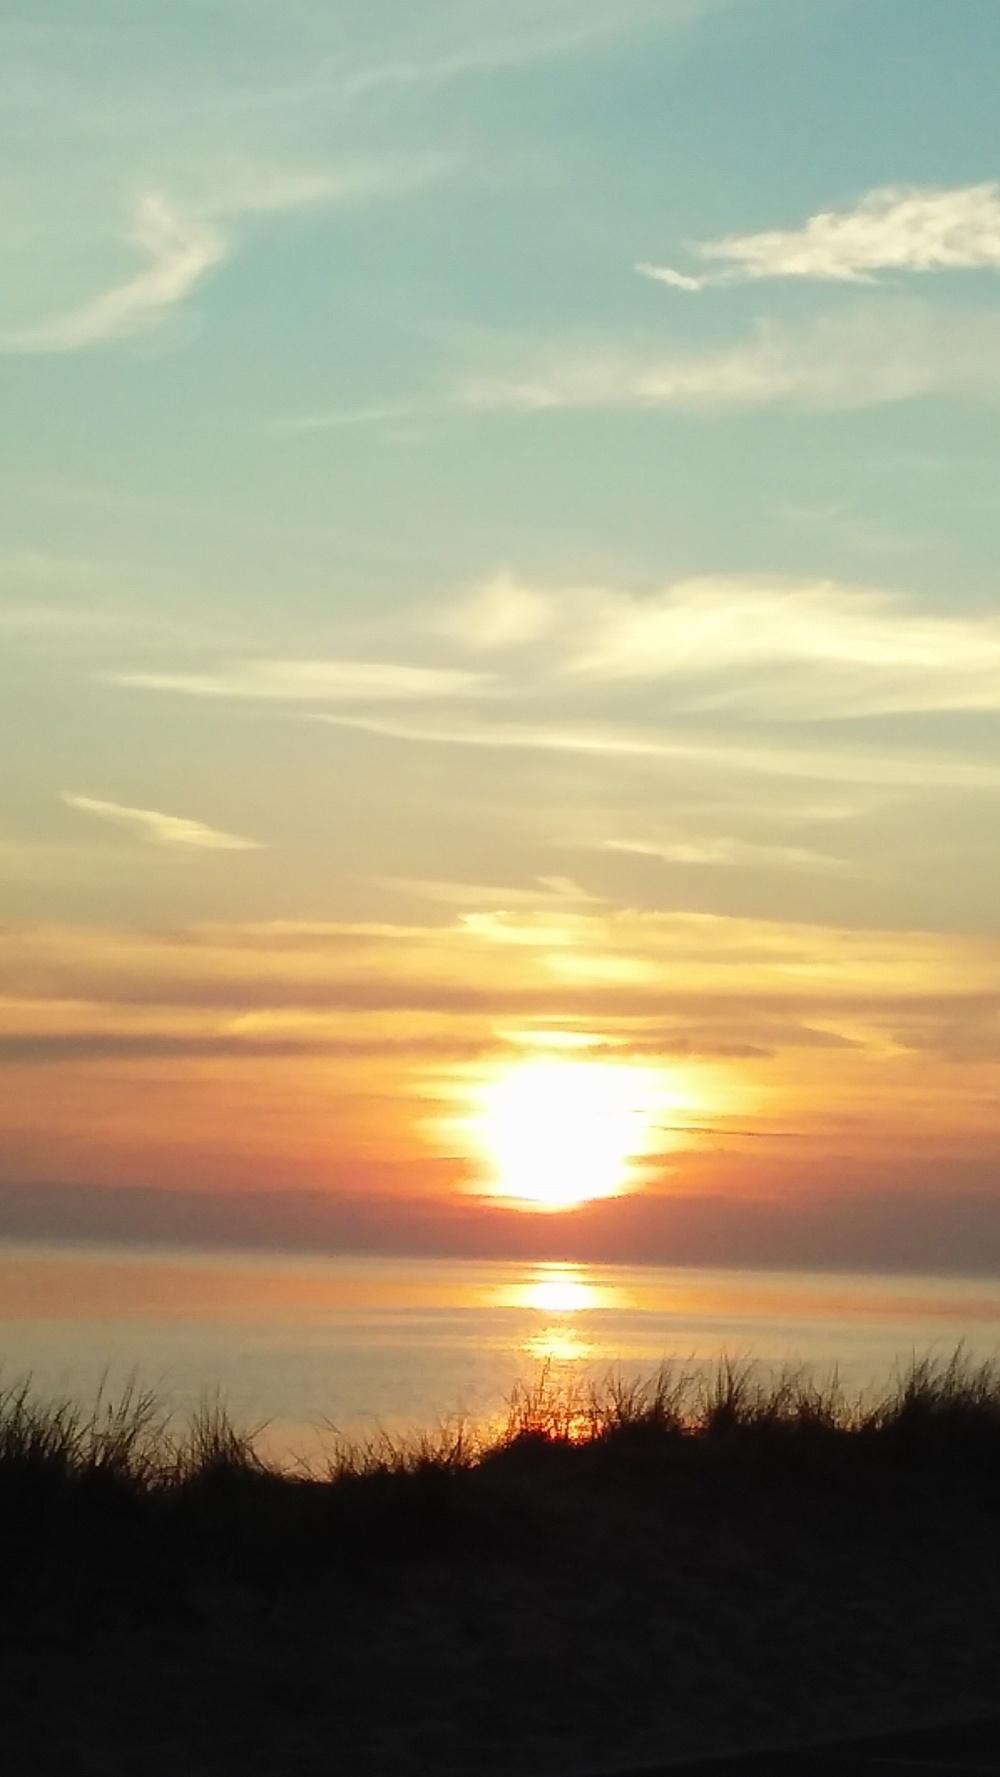 sunset2 052720